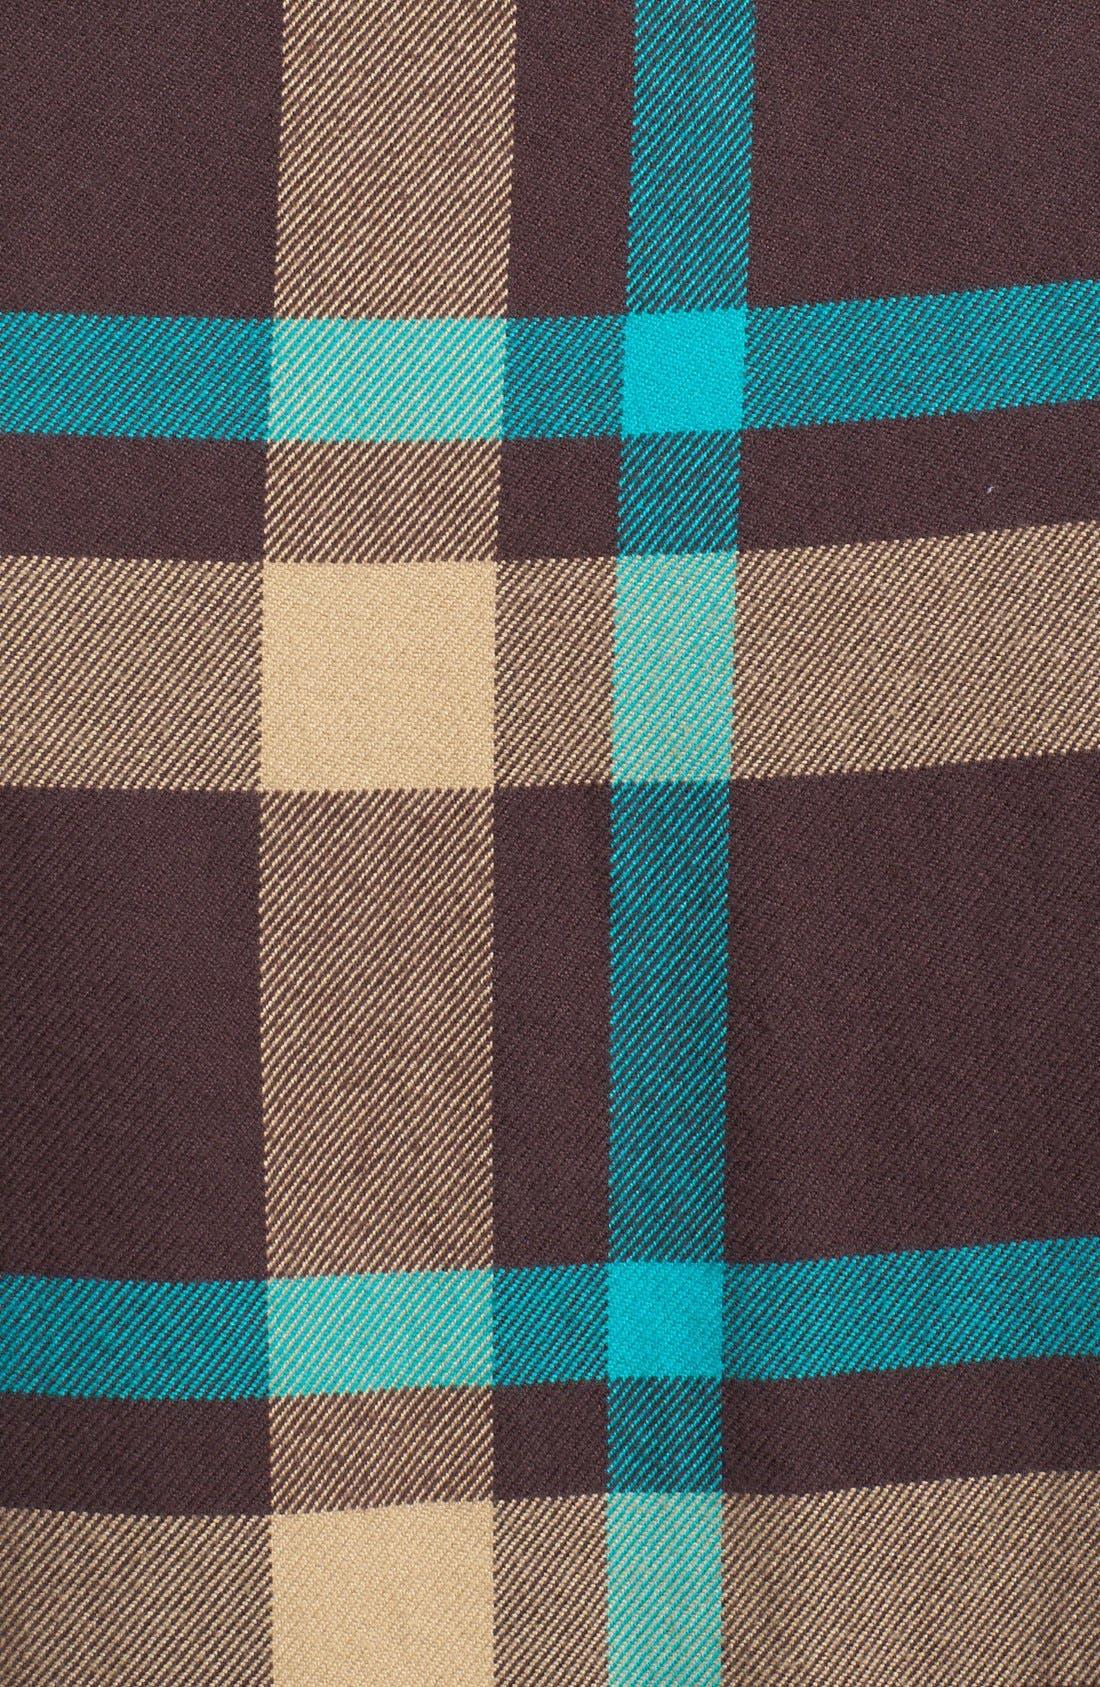 Alternate Image 3  - Patagonia 'Fjord' Regular Fit Organic Cotton Flannel Shirt